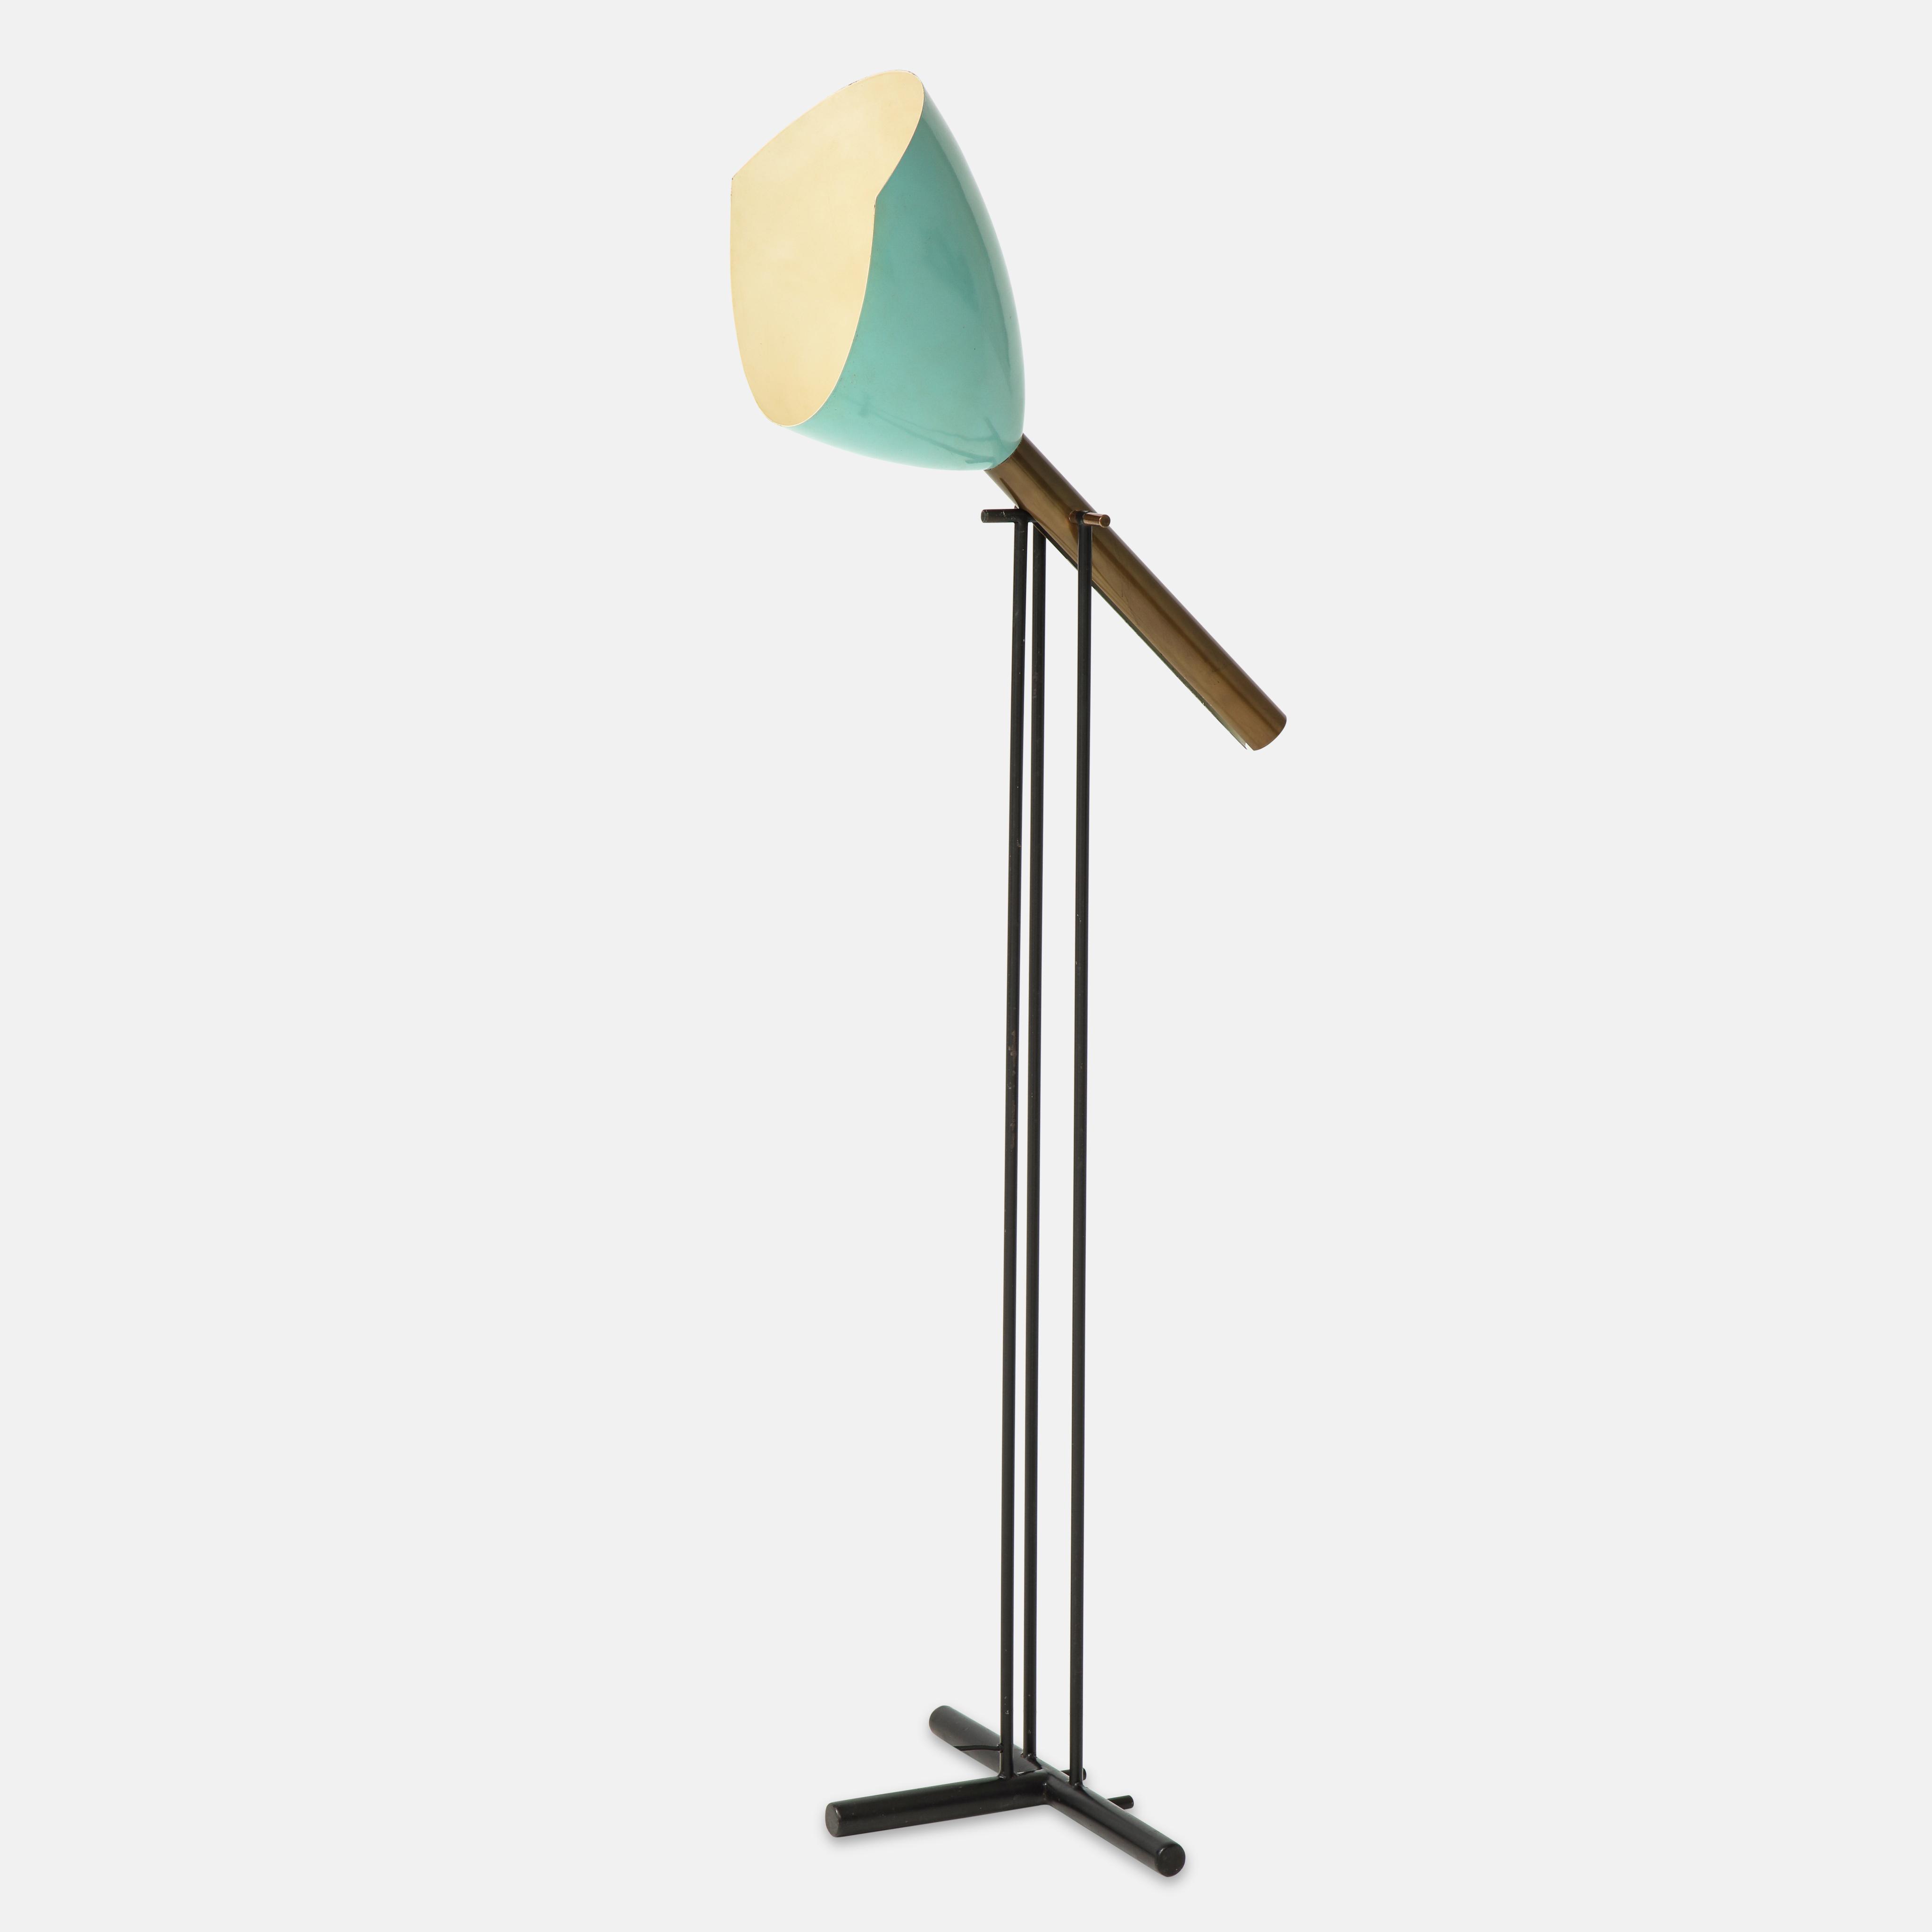 Rare 'Televisione' Floor Lamp Model 12627 by Angelo Lelii for Arredoluce | soyun k.